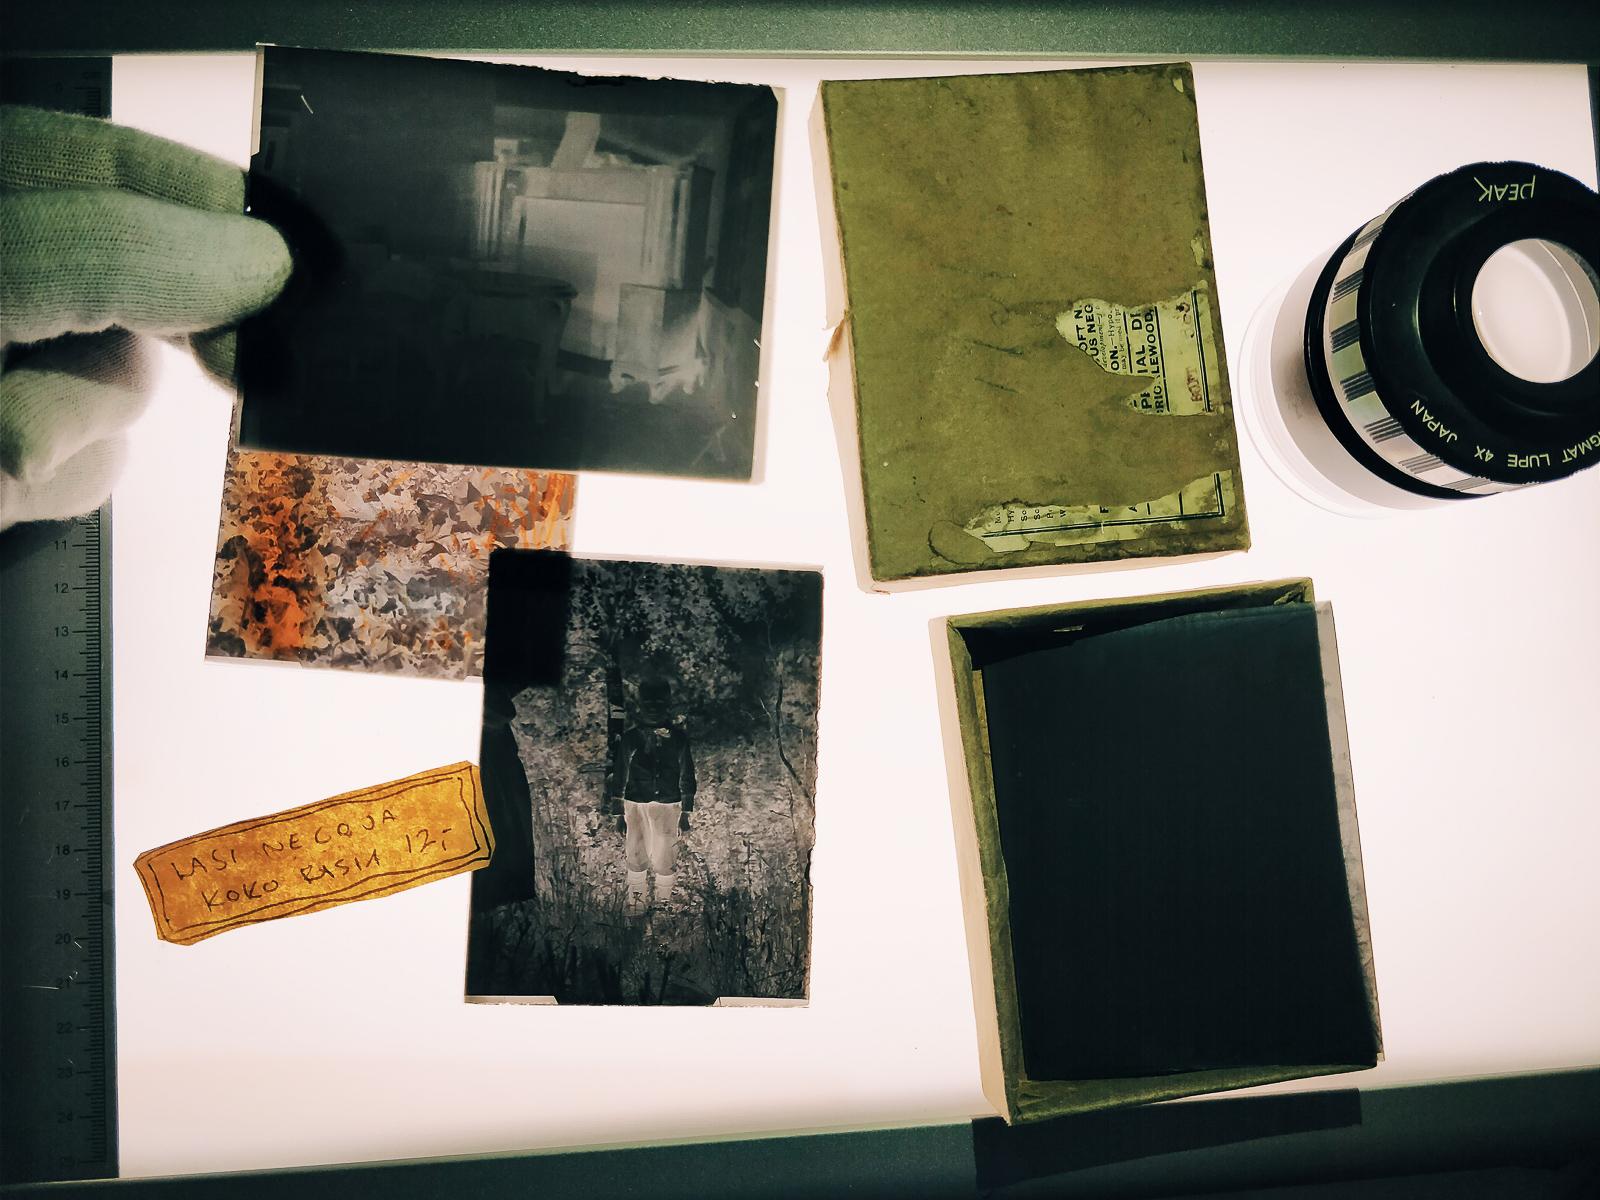 Vanhoja lasinegatiiveja